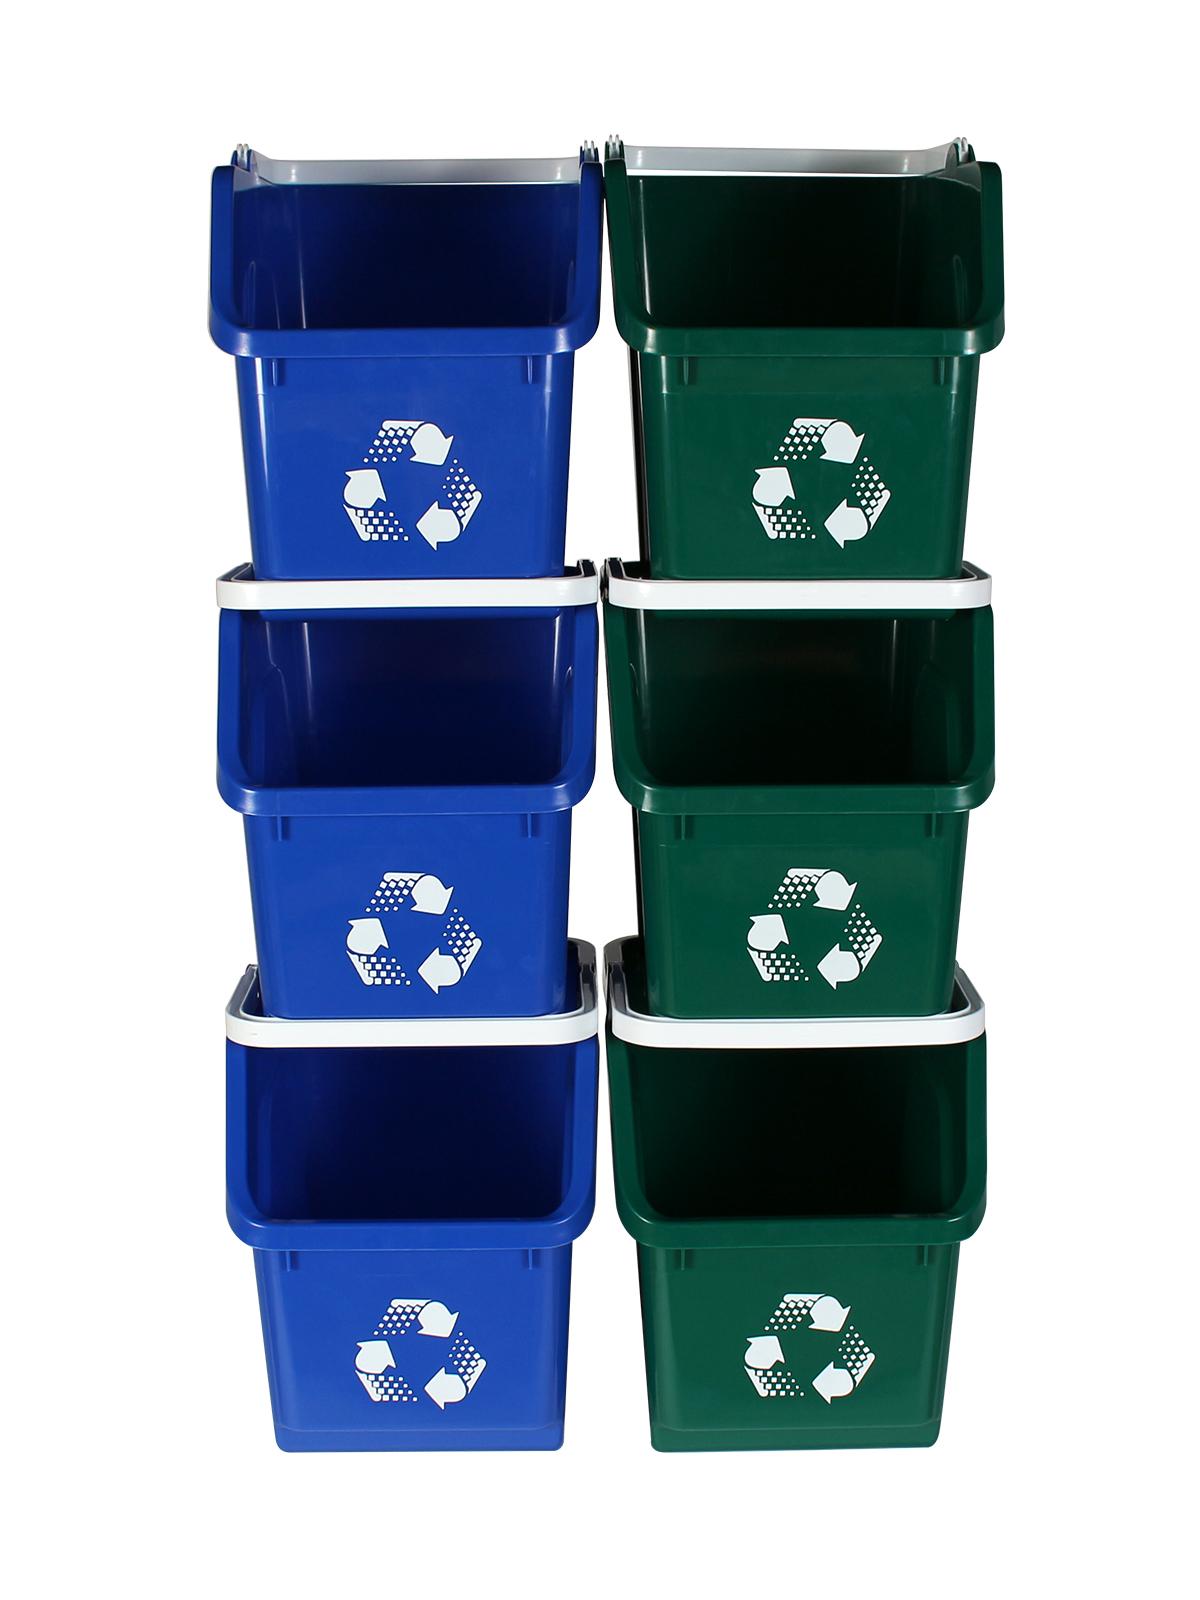 MULTI RECYCLER (6 Pack) - Double - Mobius Loop - Full - Blue-Green